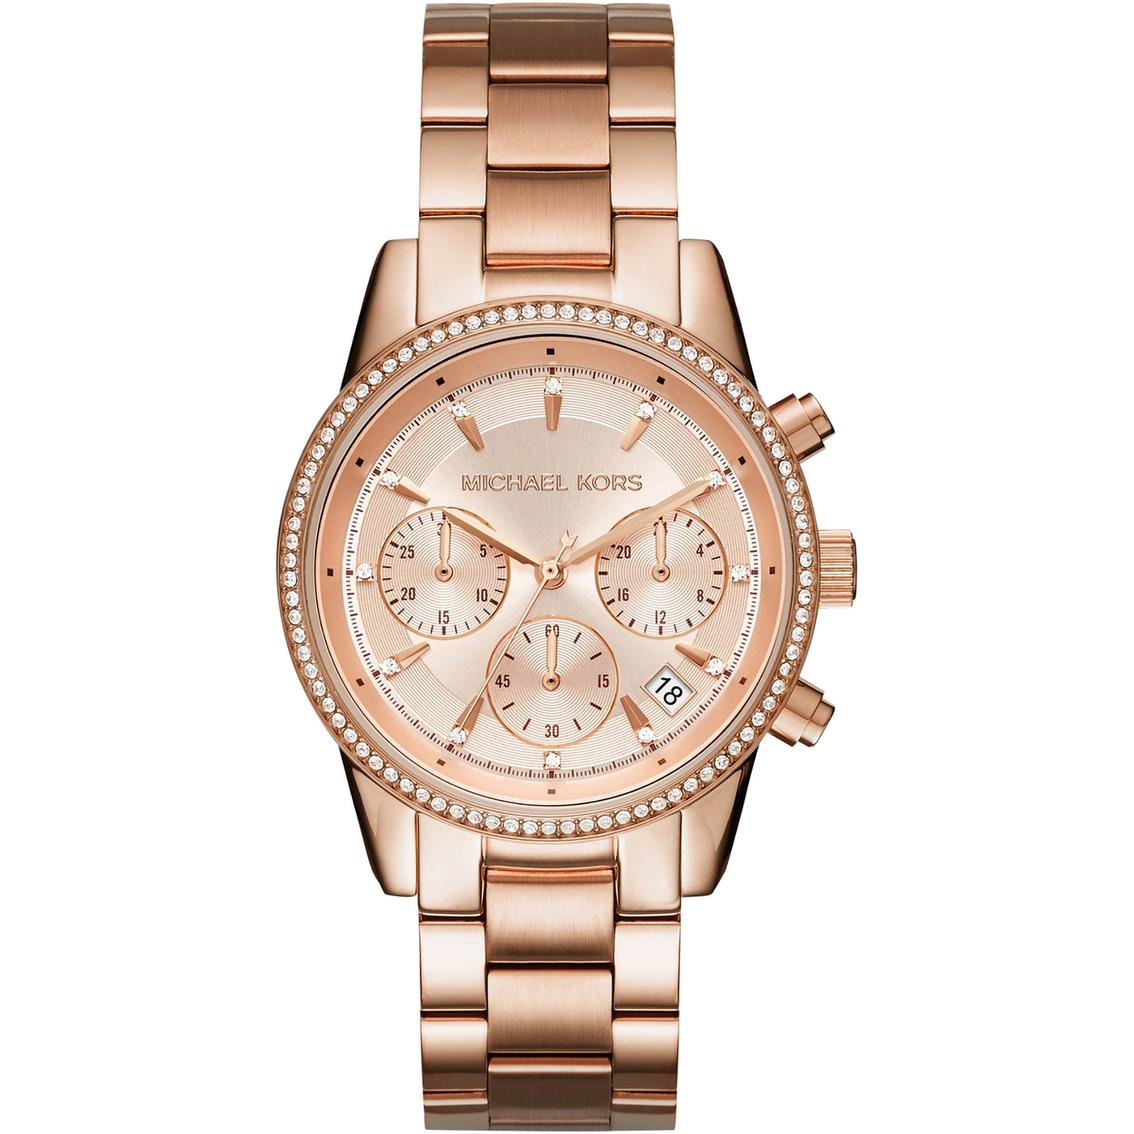 feb503b761d4 Michael Kors Women s Ritz Rose Gold Tone Chronograph Watch 37MM MK6428